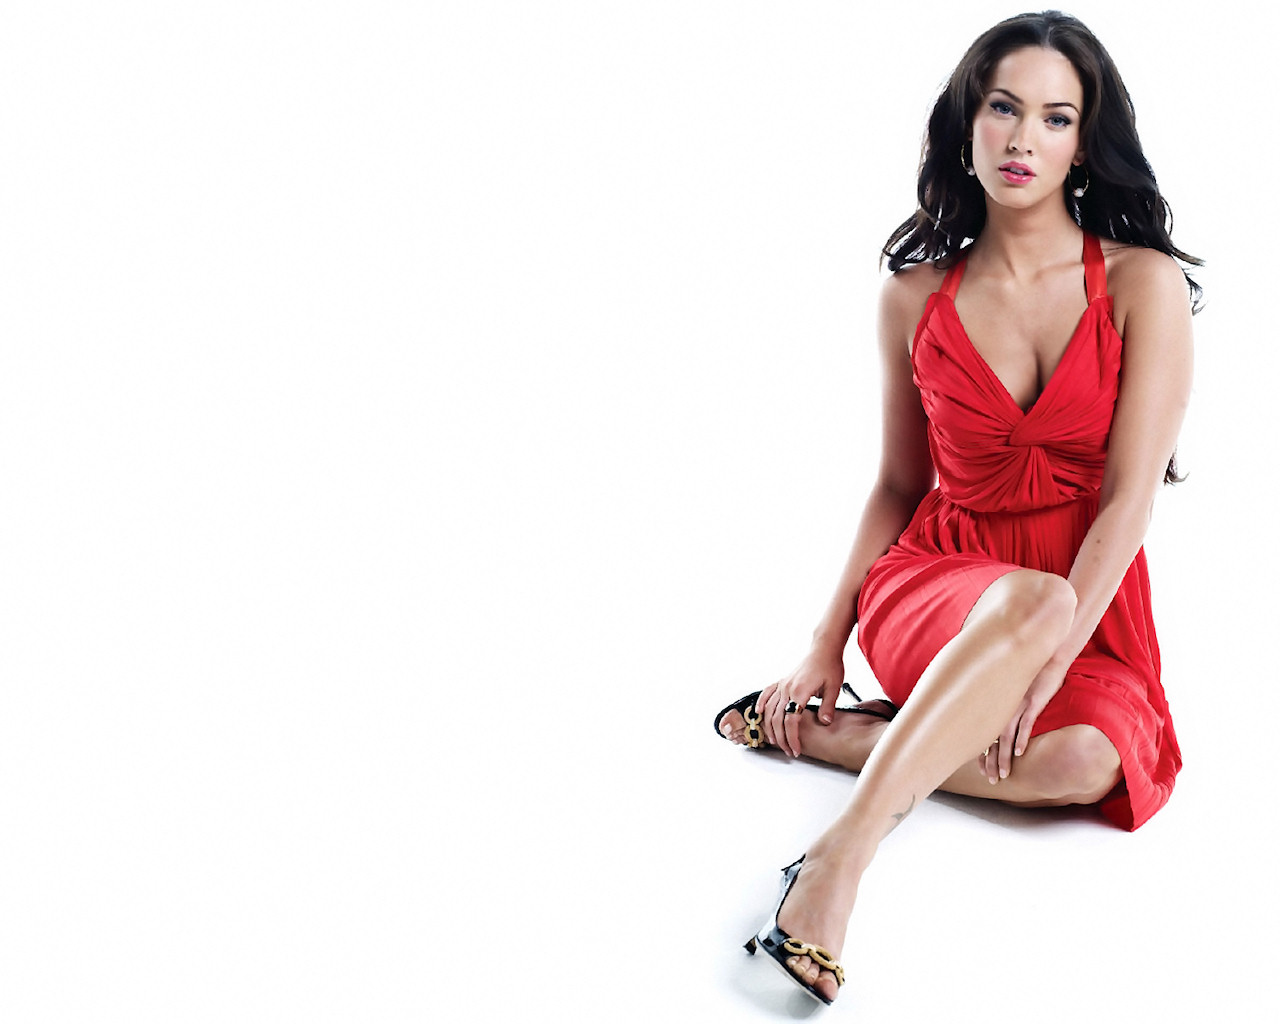 Megan Fox red dress wallpapers 1280×1024 - Obama Pacman